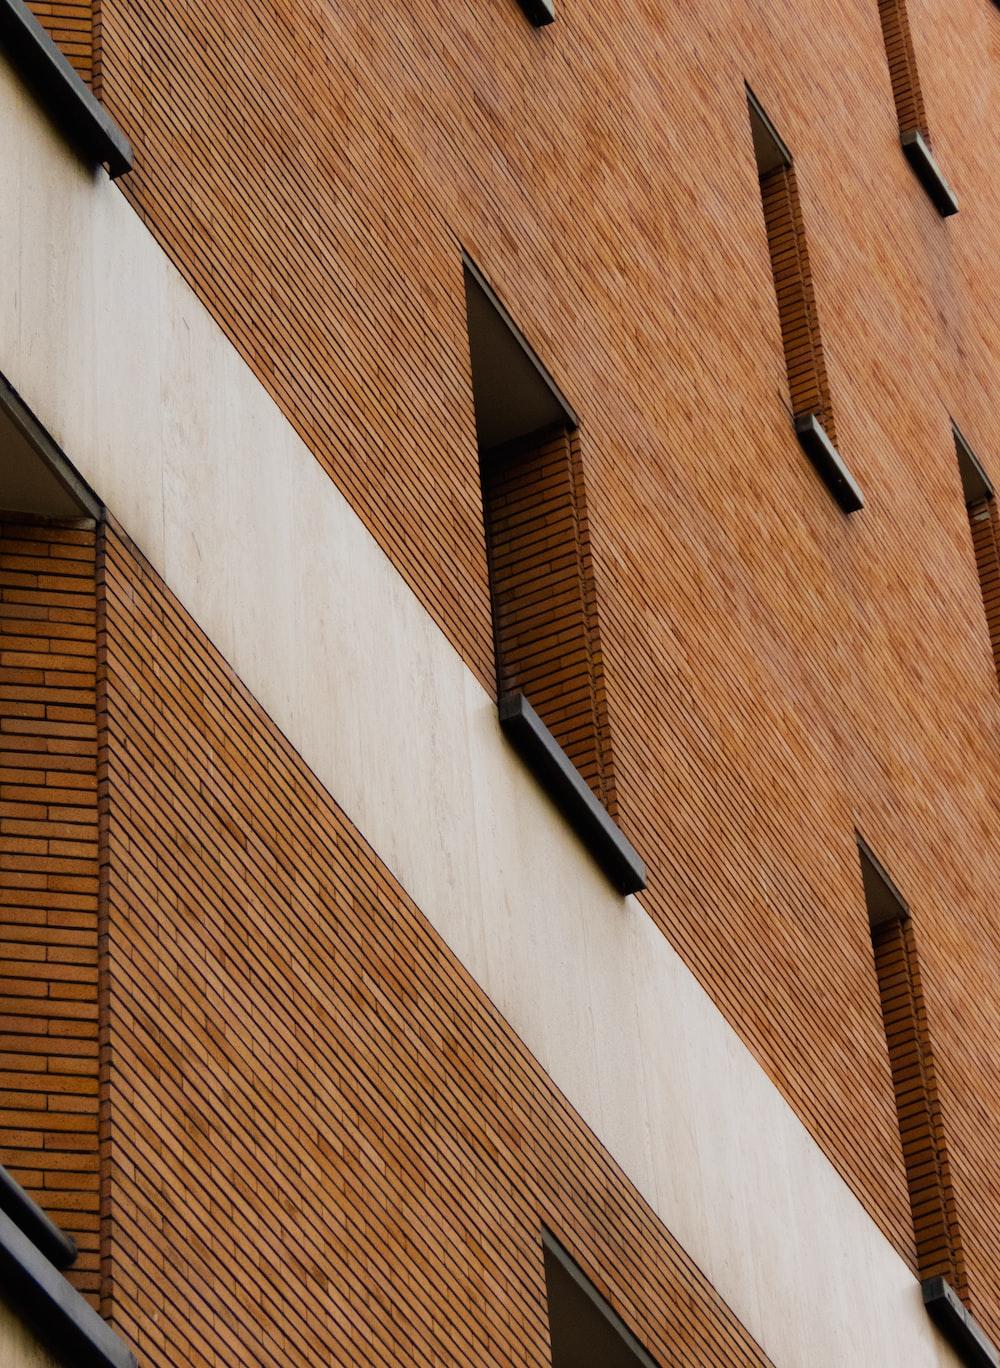 brown brick building with black window